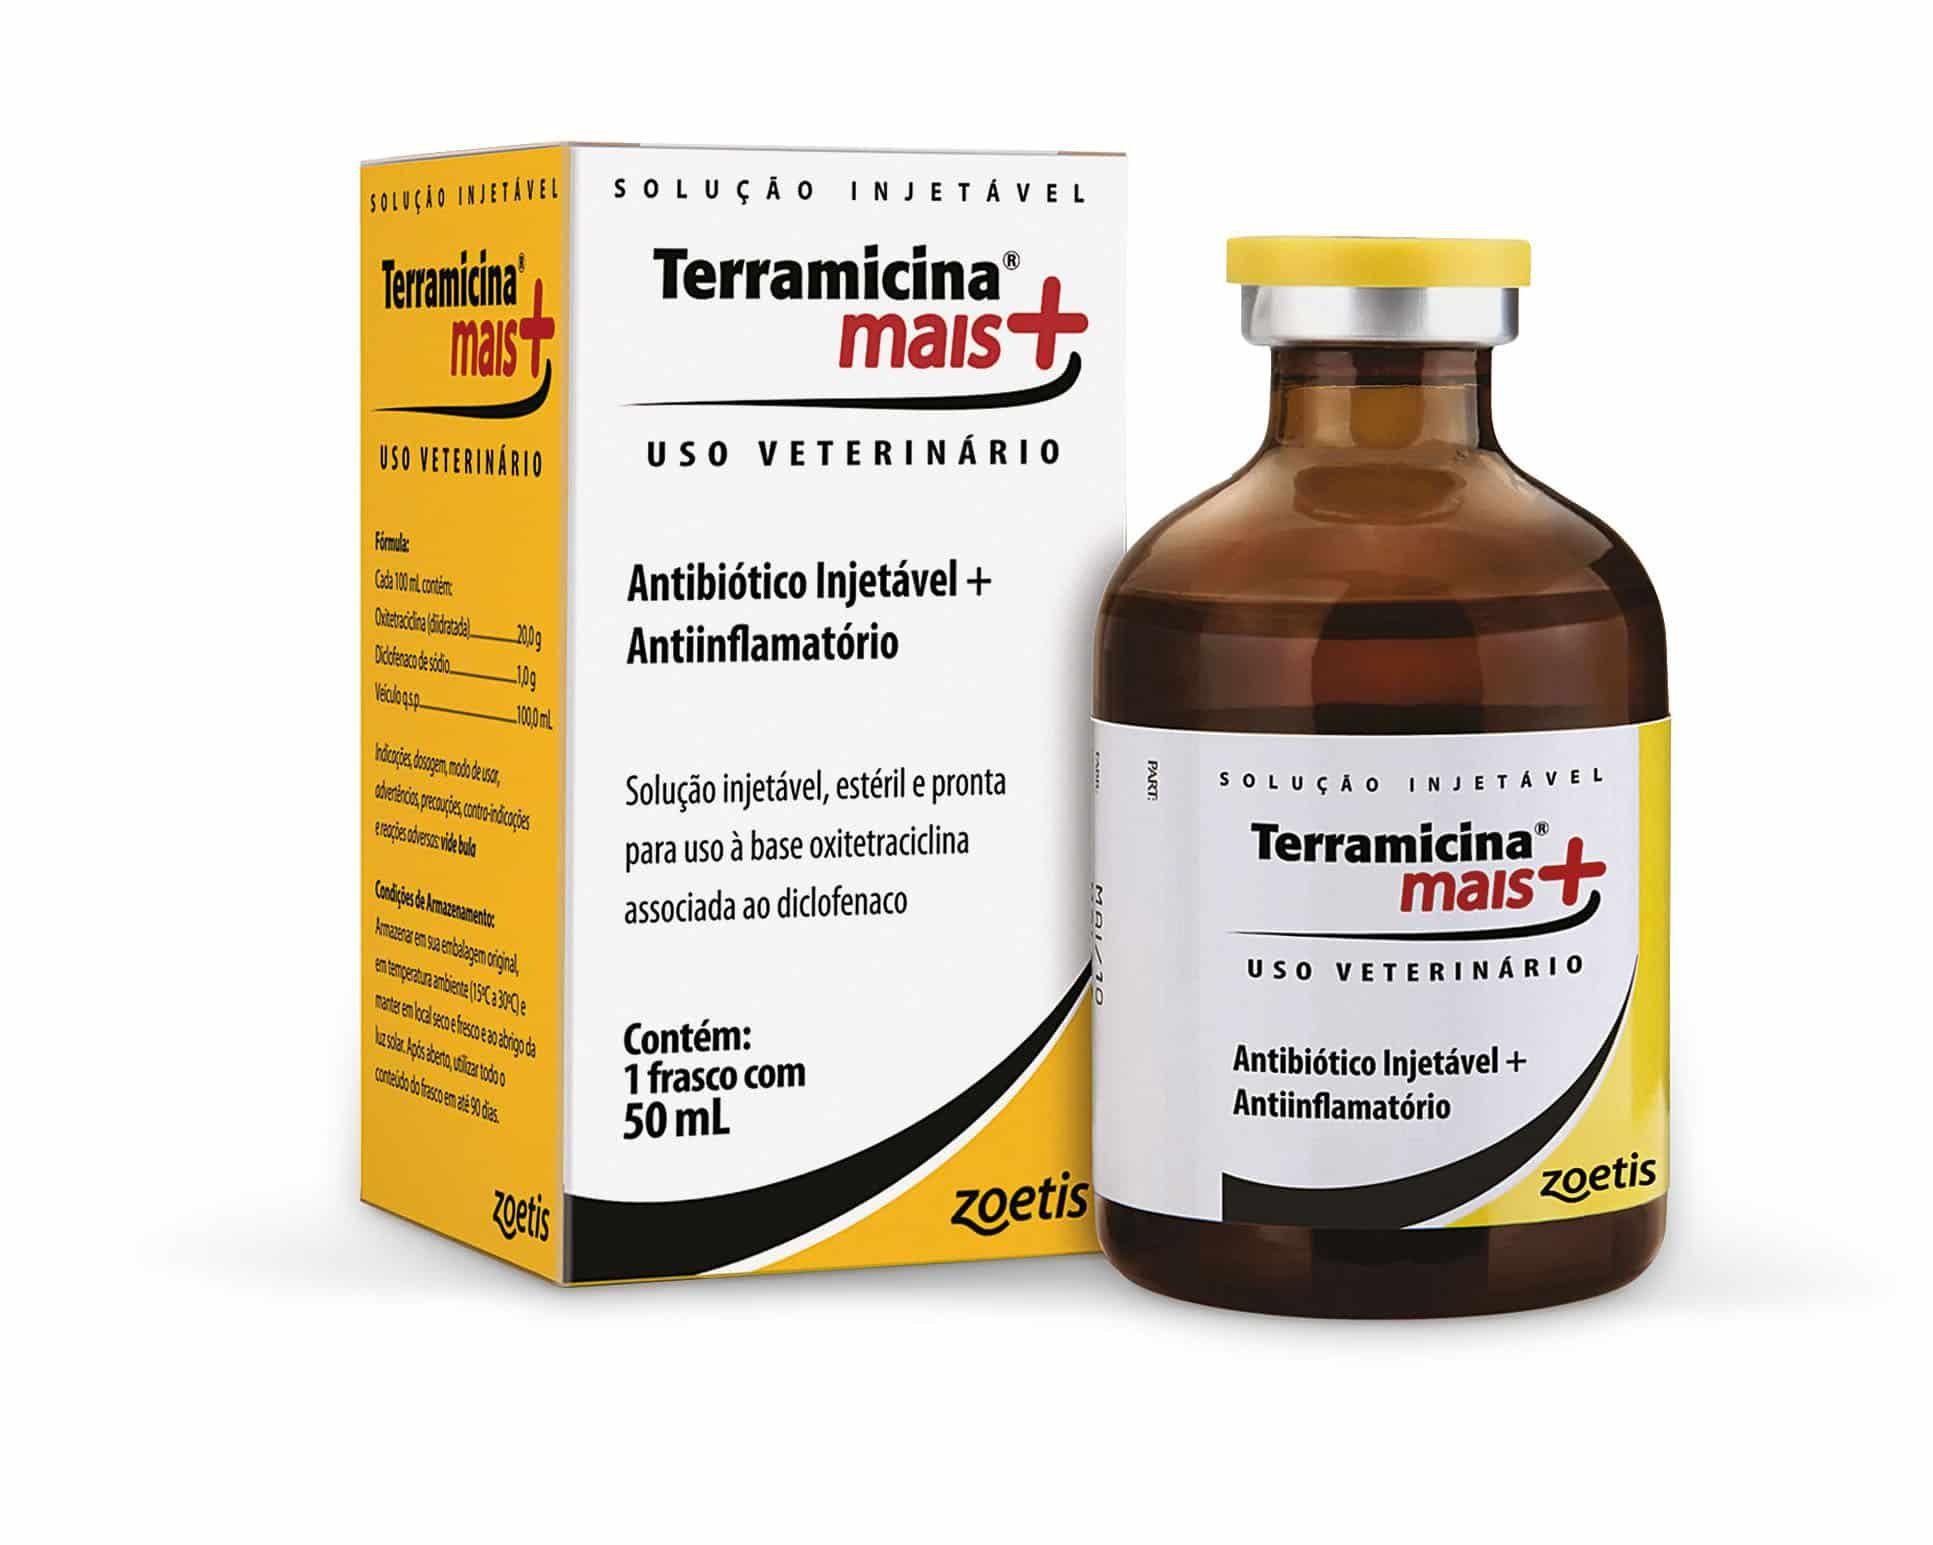 TERRAMICINA_MAIS ANTIBIÓTICO E ANTI-INFLAMATÓRIO INJETÁVEL 50 ML